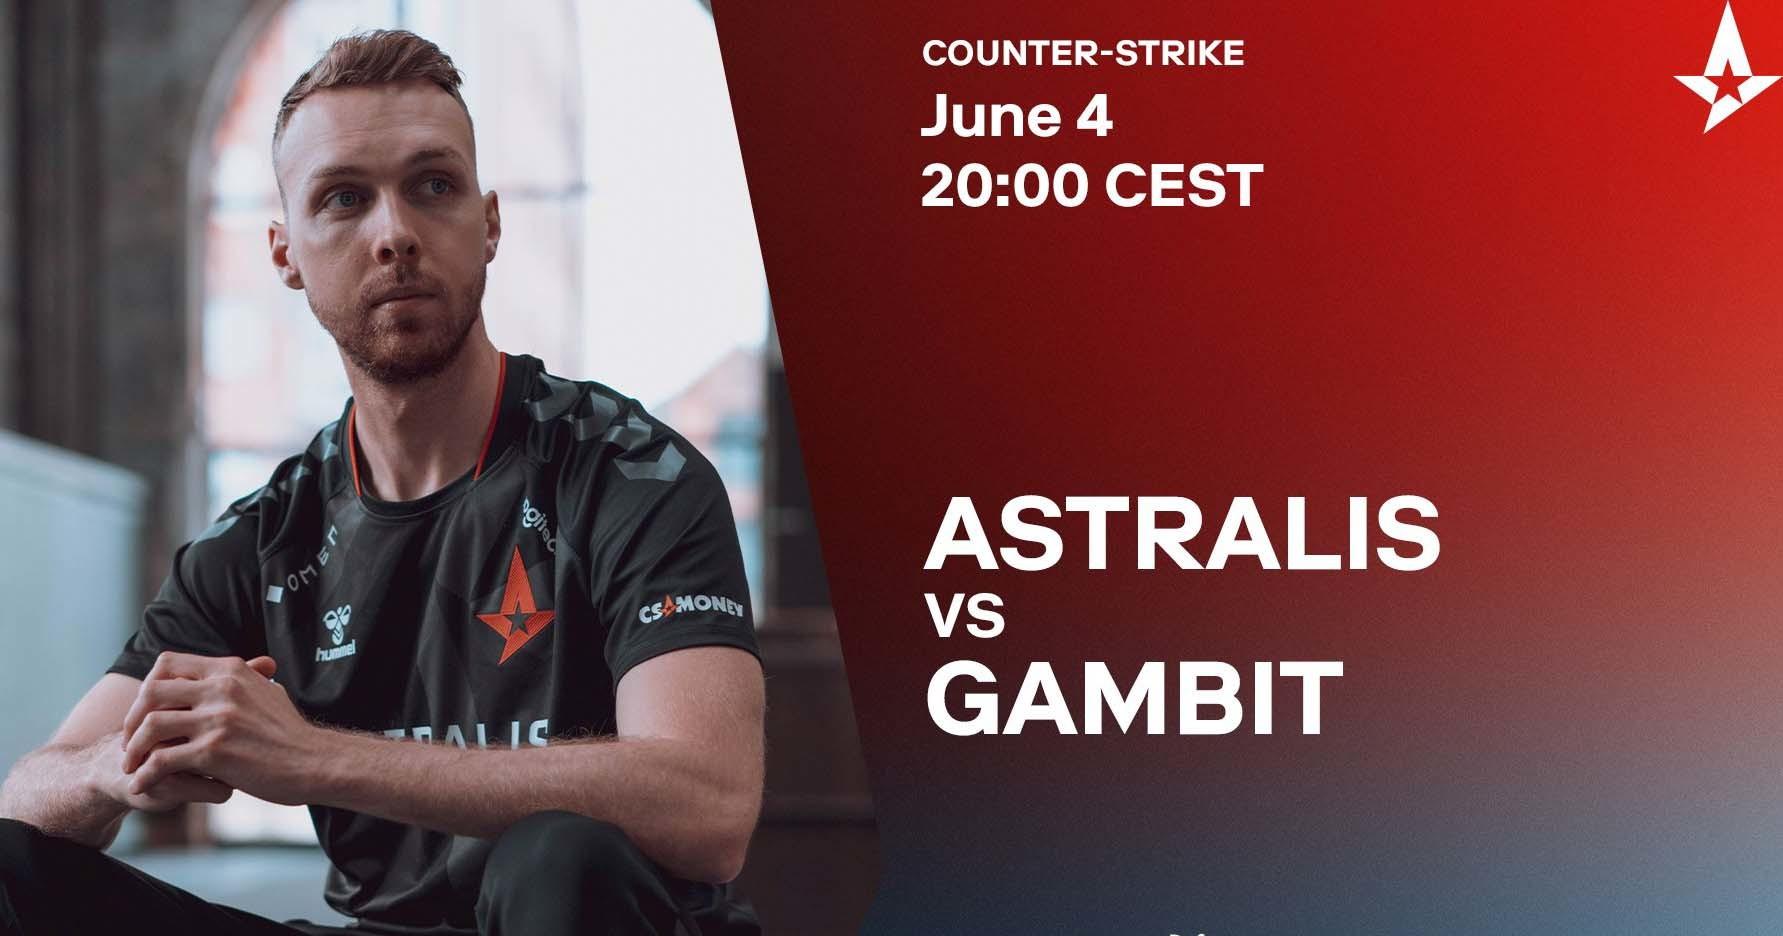 Spirit vermöbelt Imperial - Astralis nun gegen Gambit